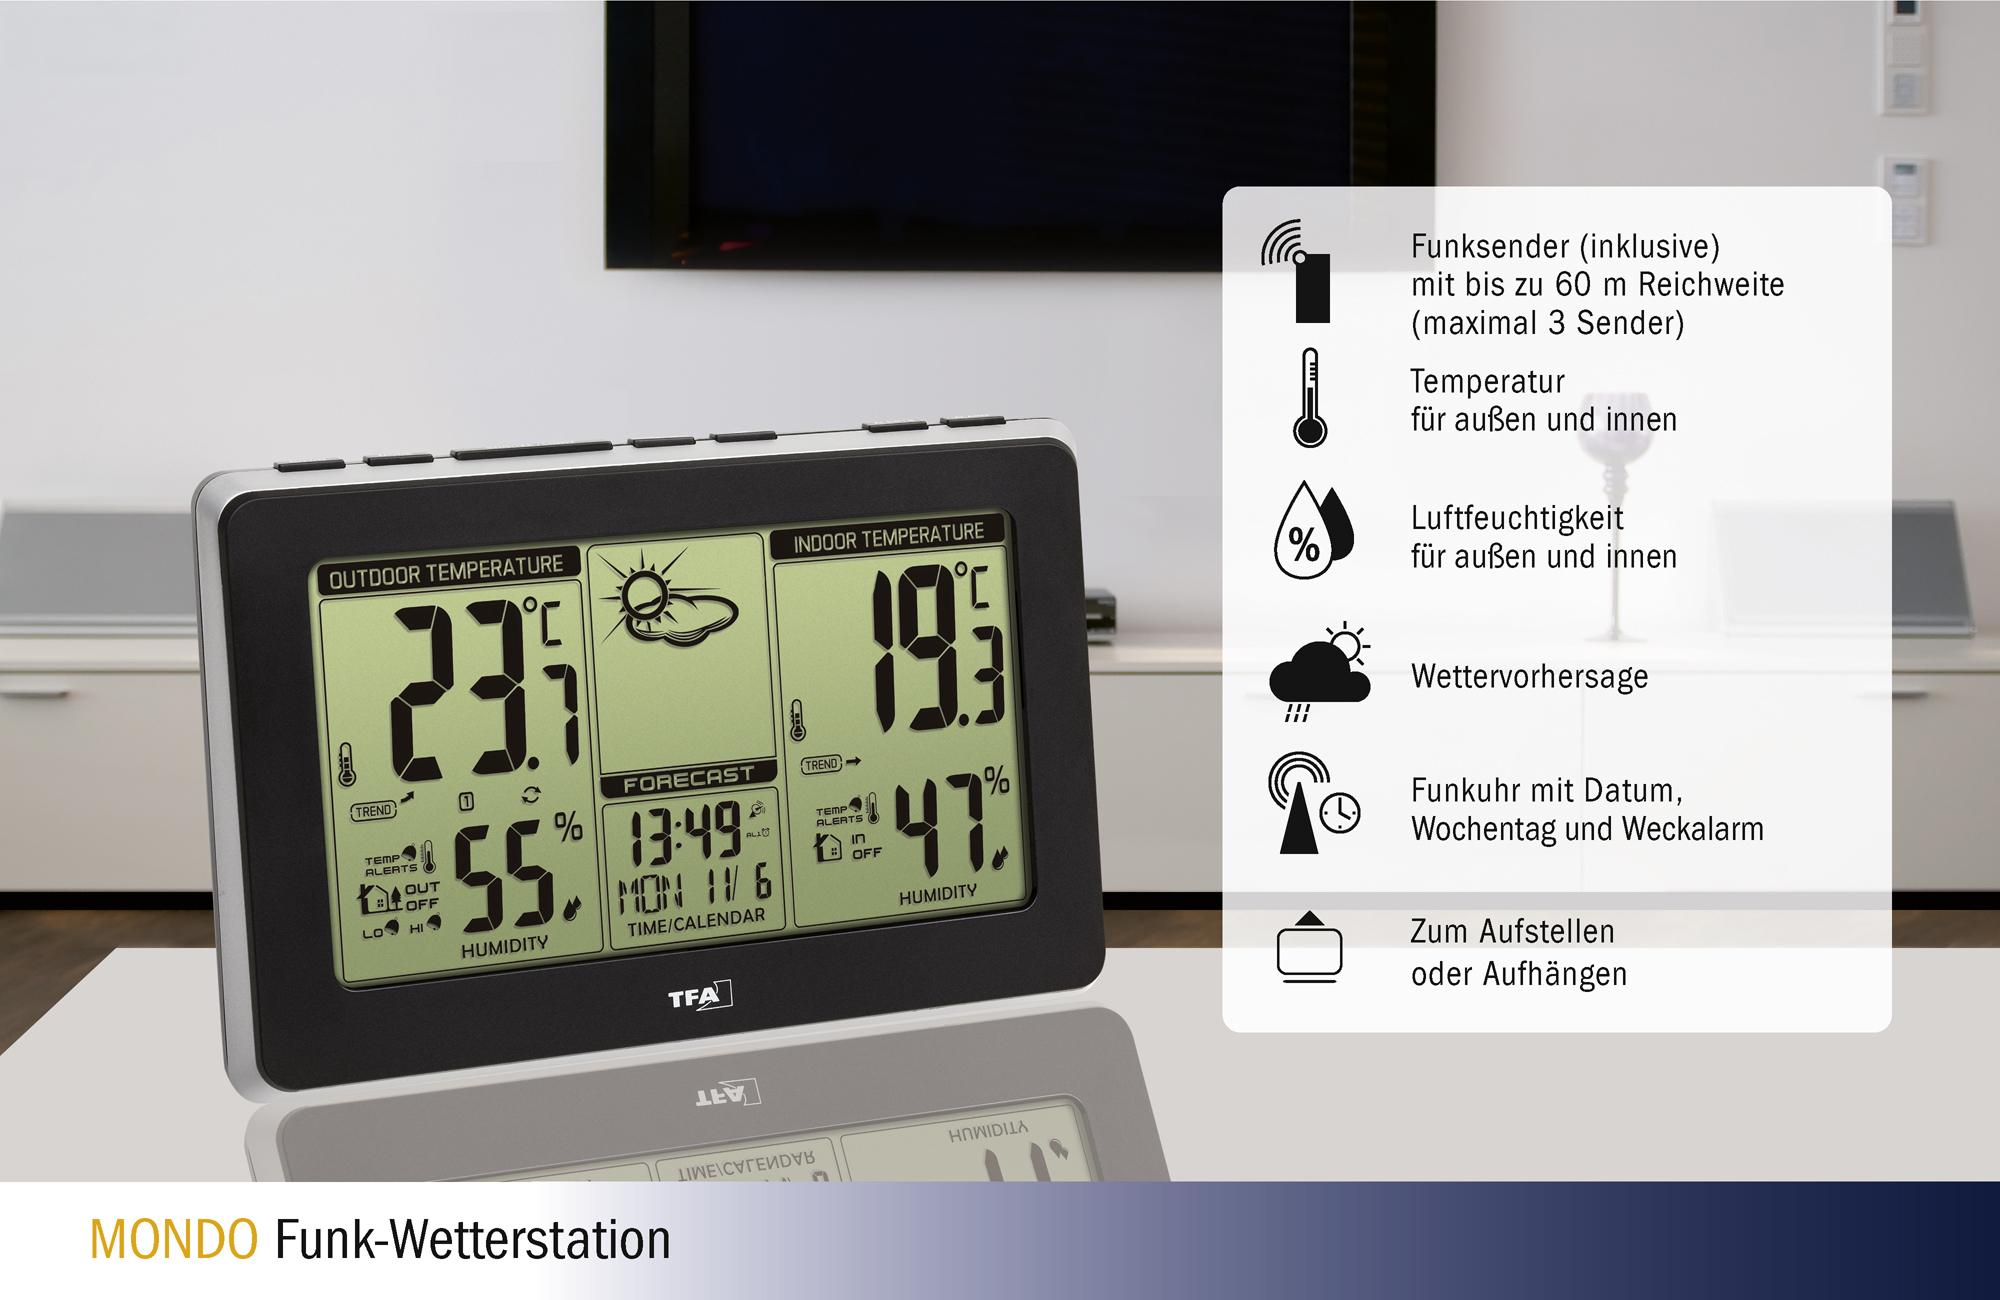 Mondo_Funk-Wetterstation_351151_Icons.jpg